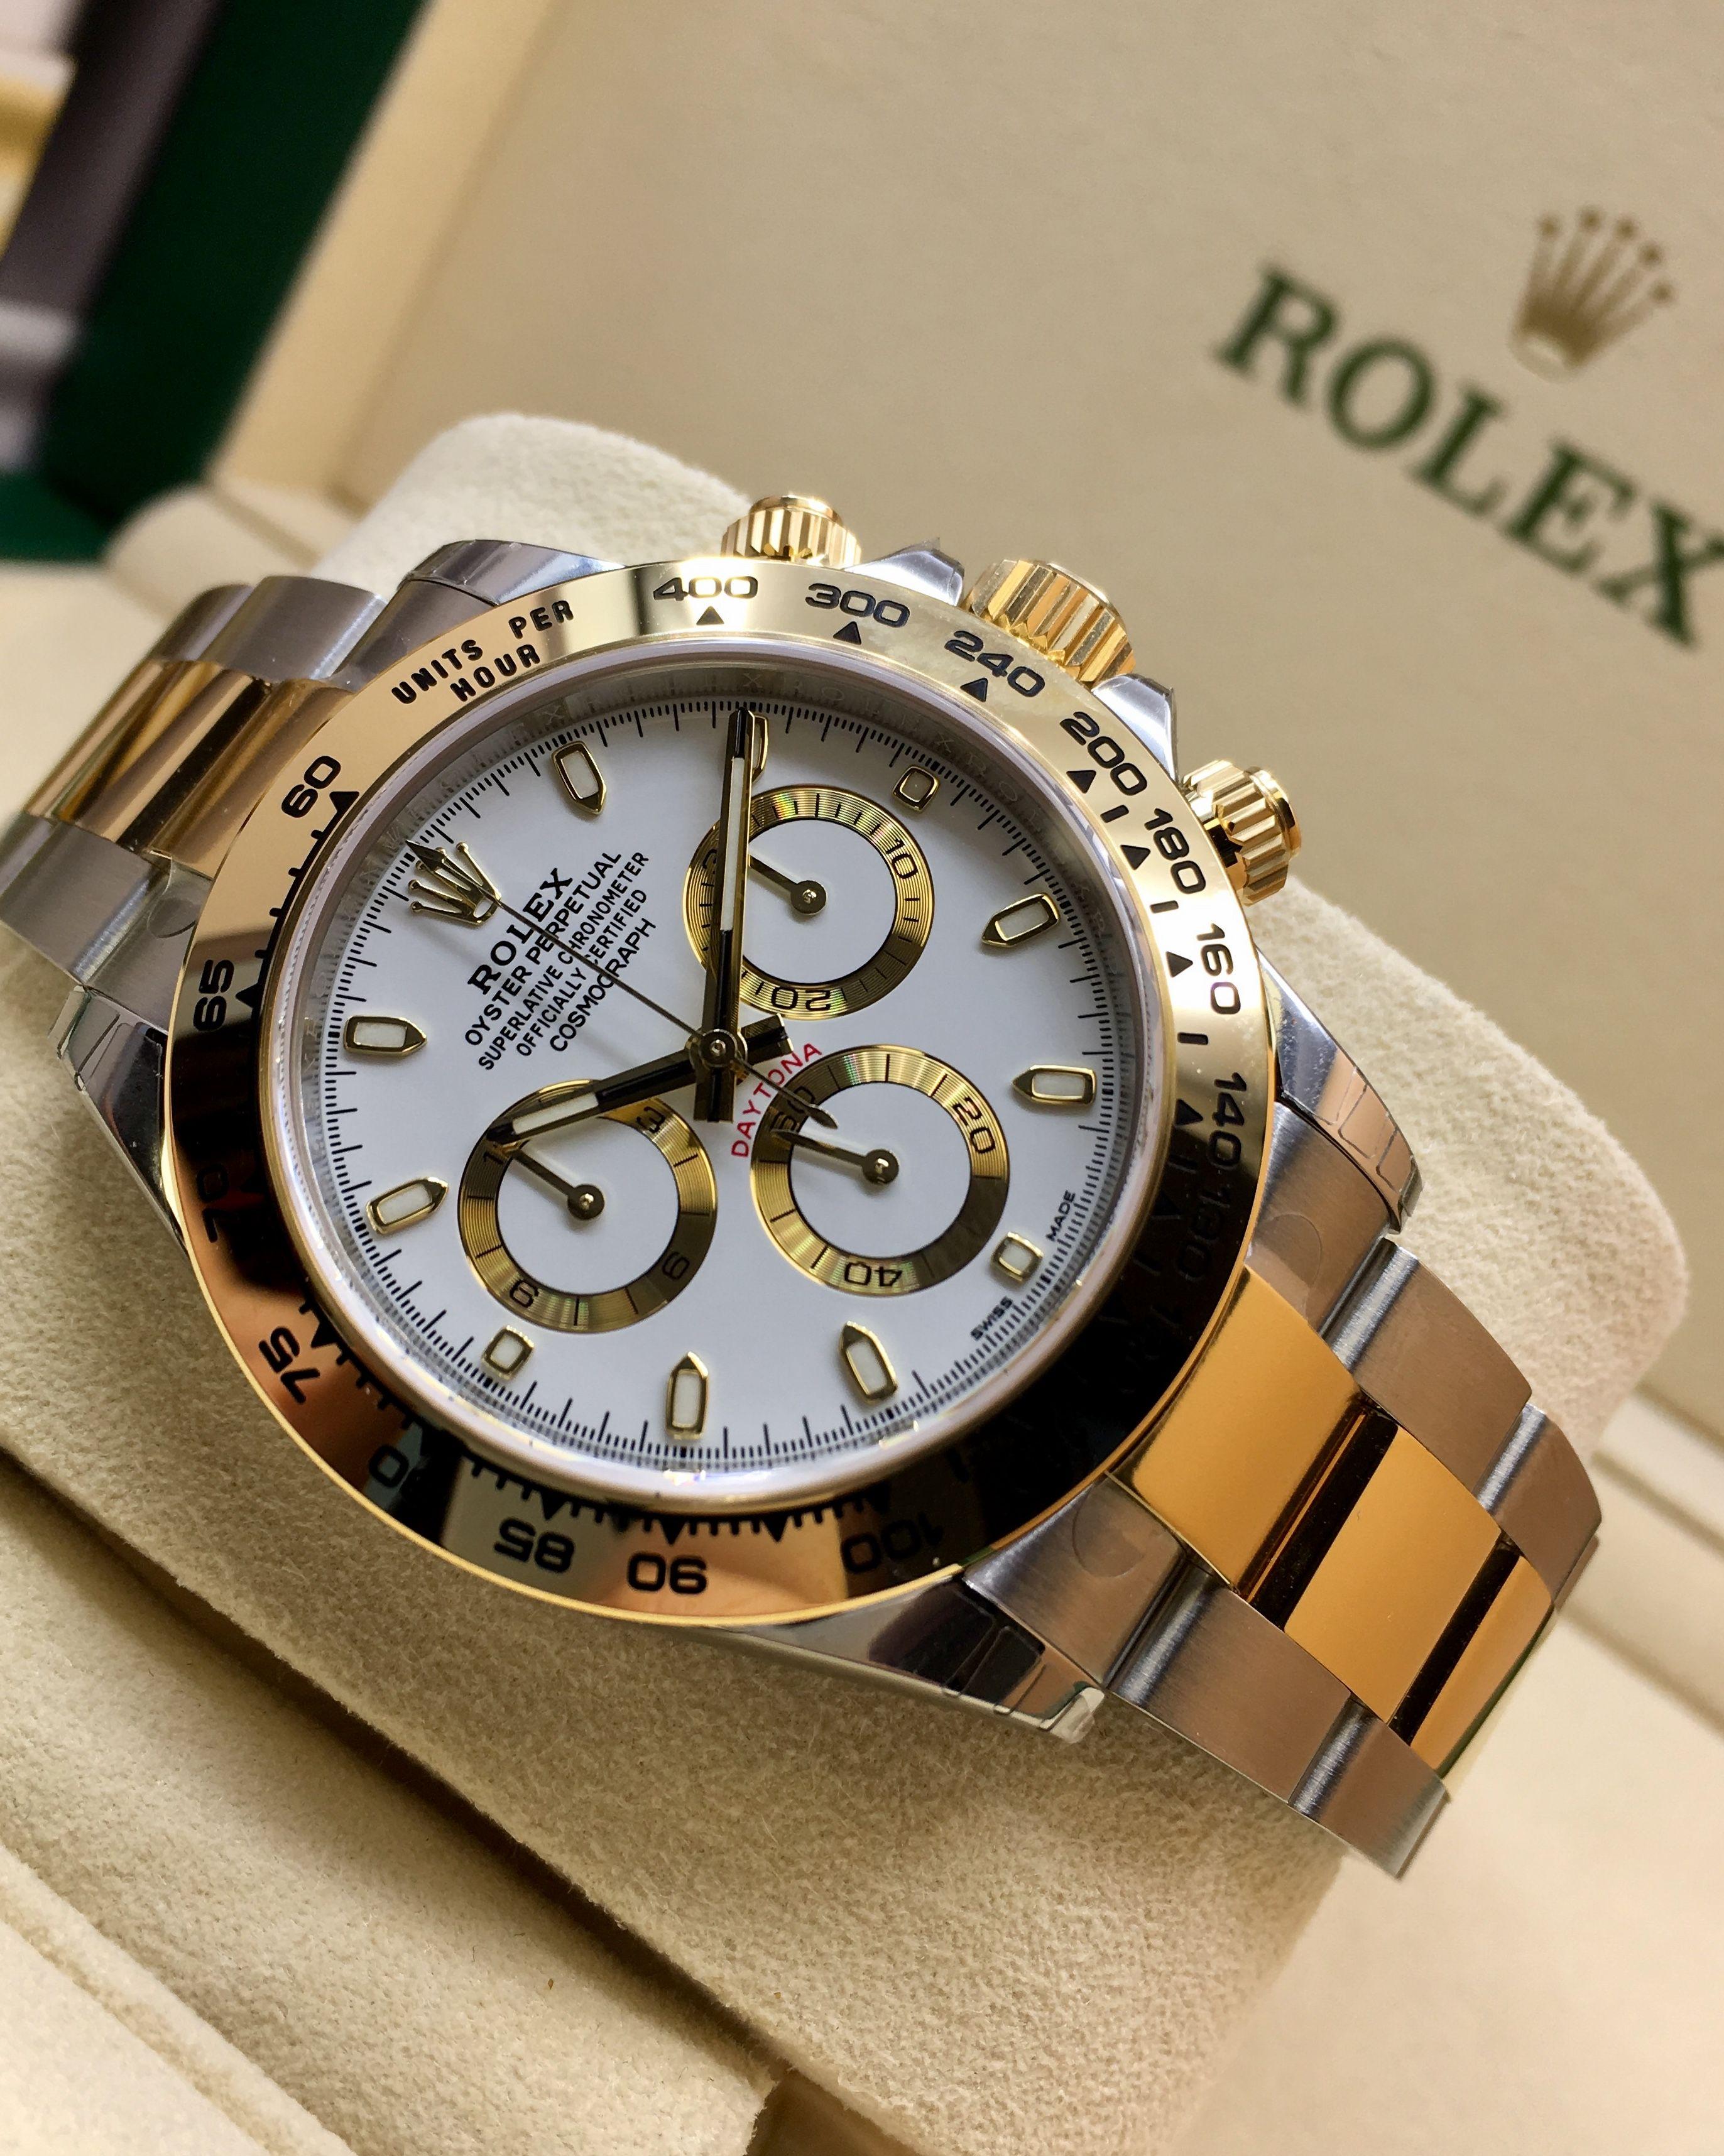 cda8b7faee9 Rolex Daytona Steel   Gold White Dial 116503